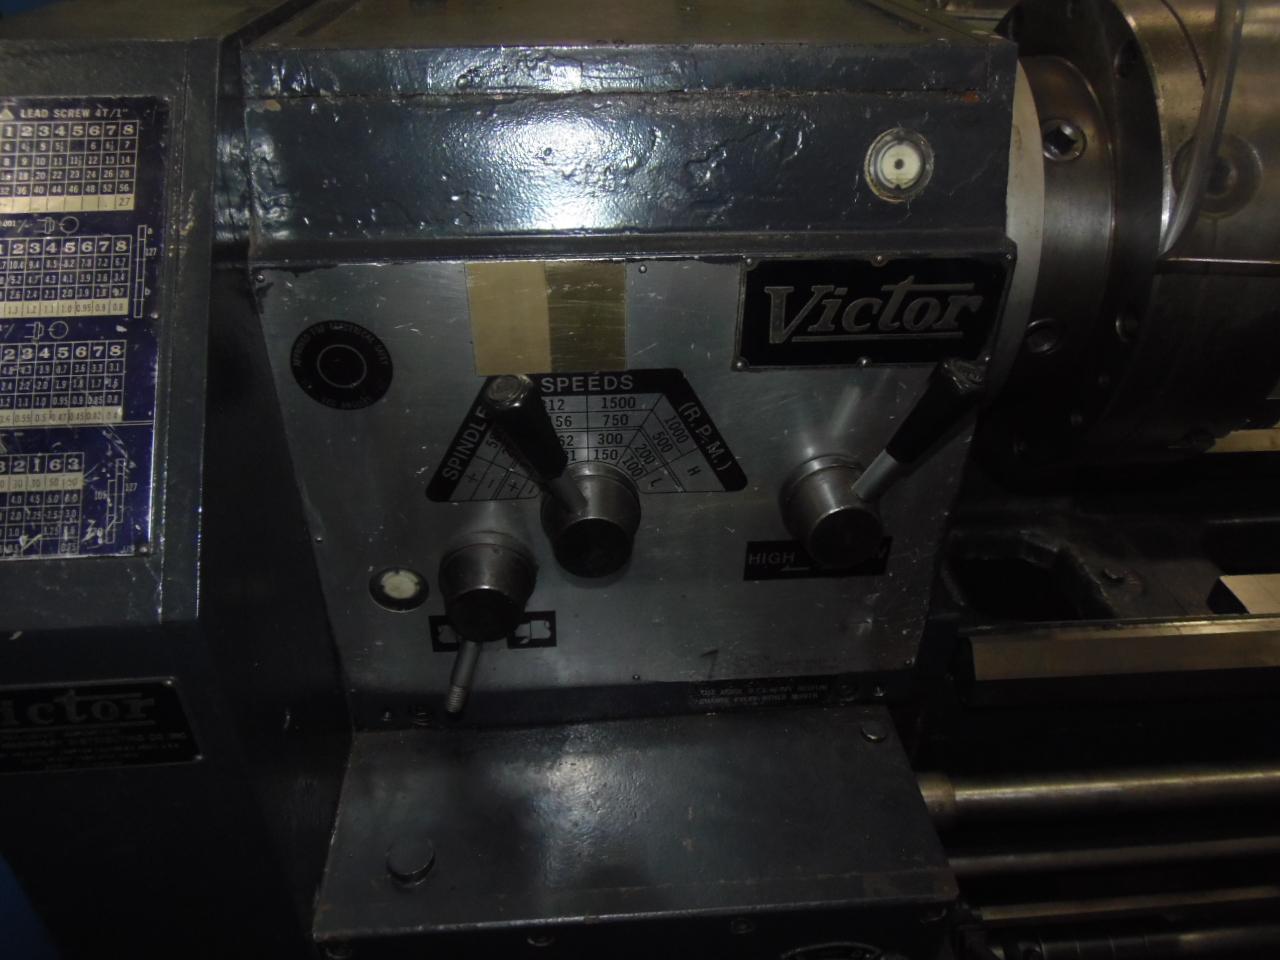 "20 X 60 VICTOR MODEL 2060, 12"" 3J, 3 1/8"" HOLE, 1500 RPM, INCH/METRIC THREADING"